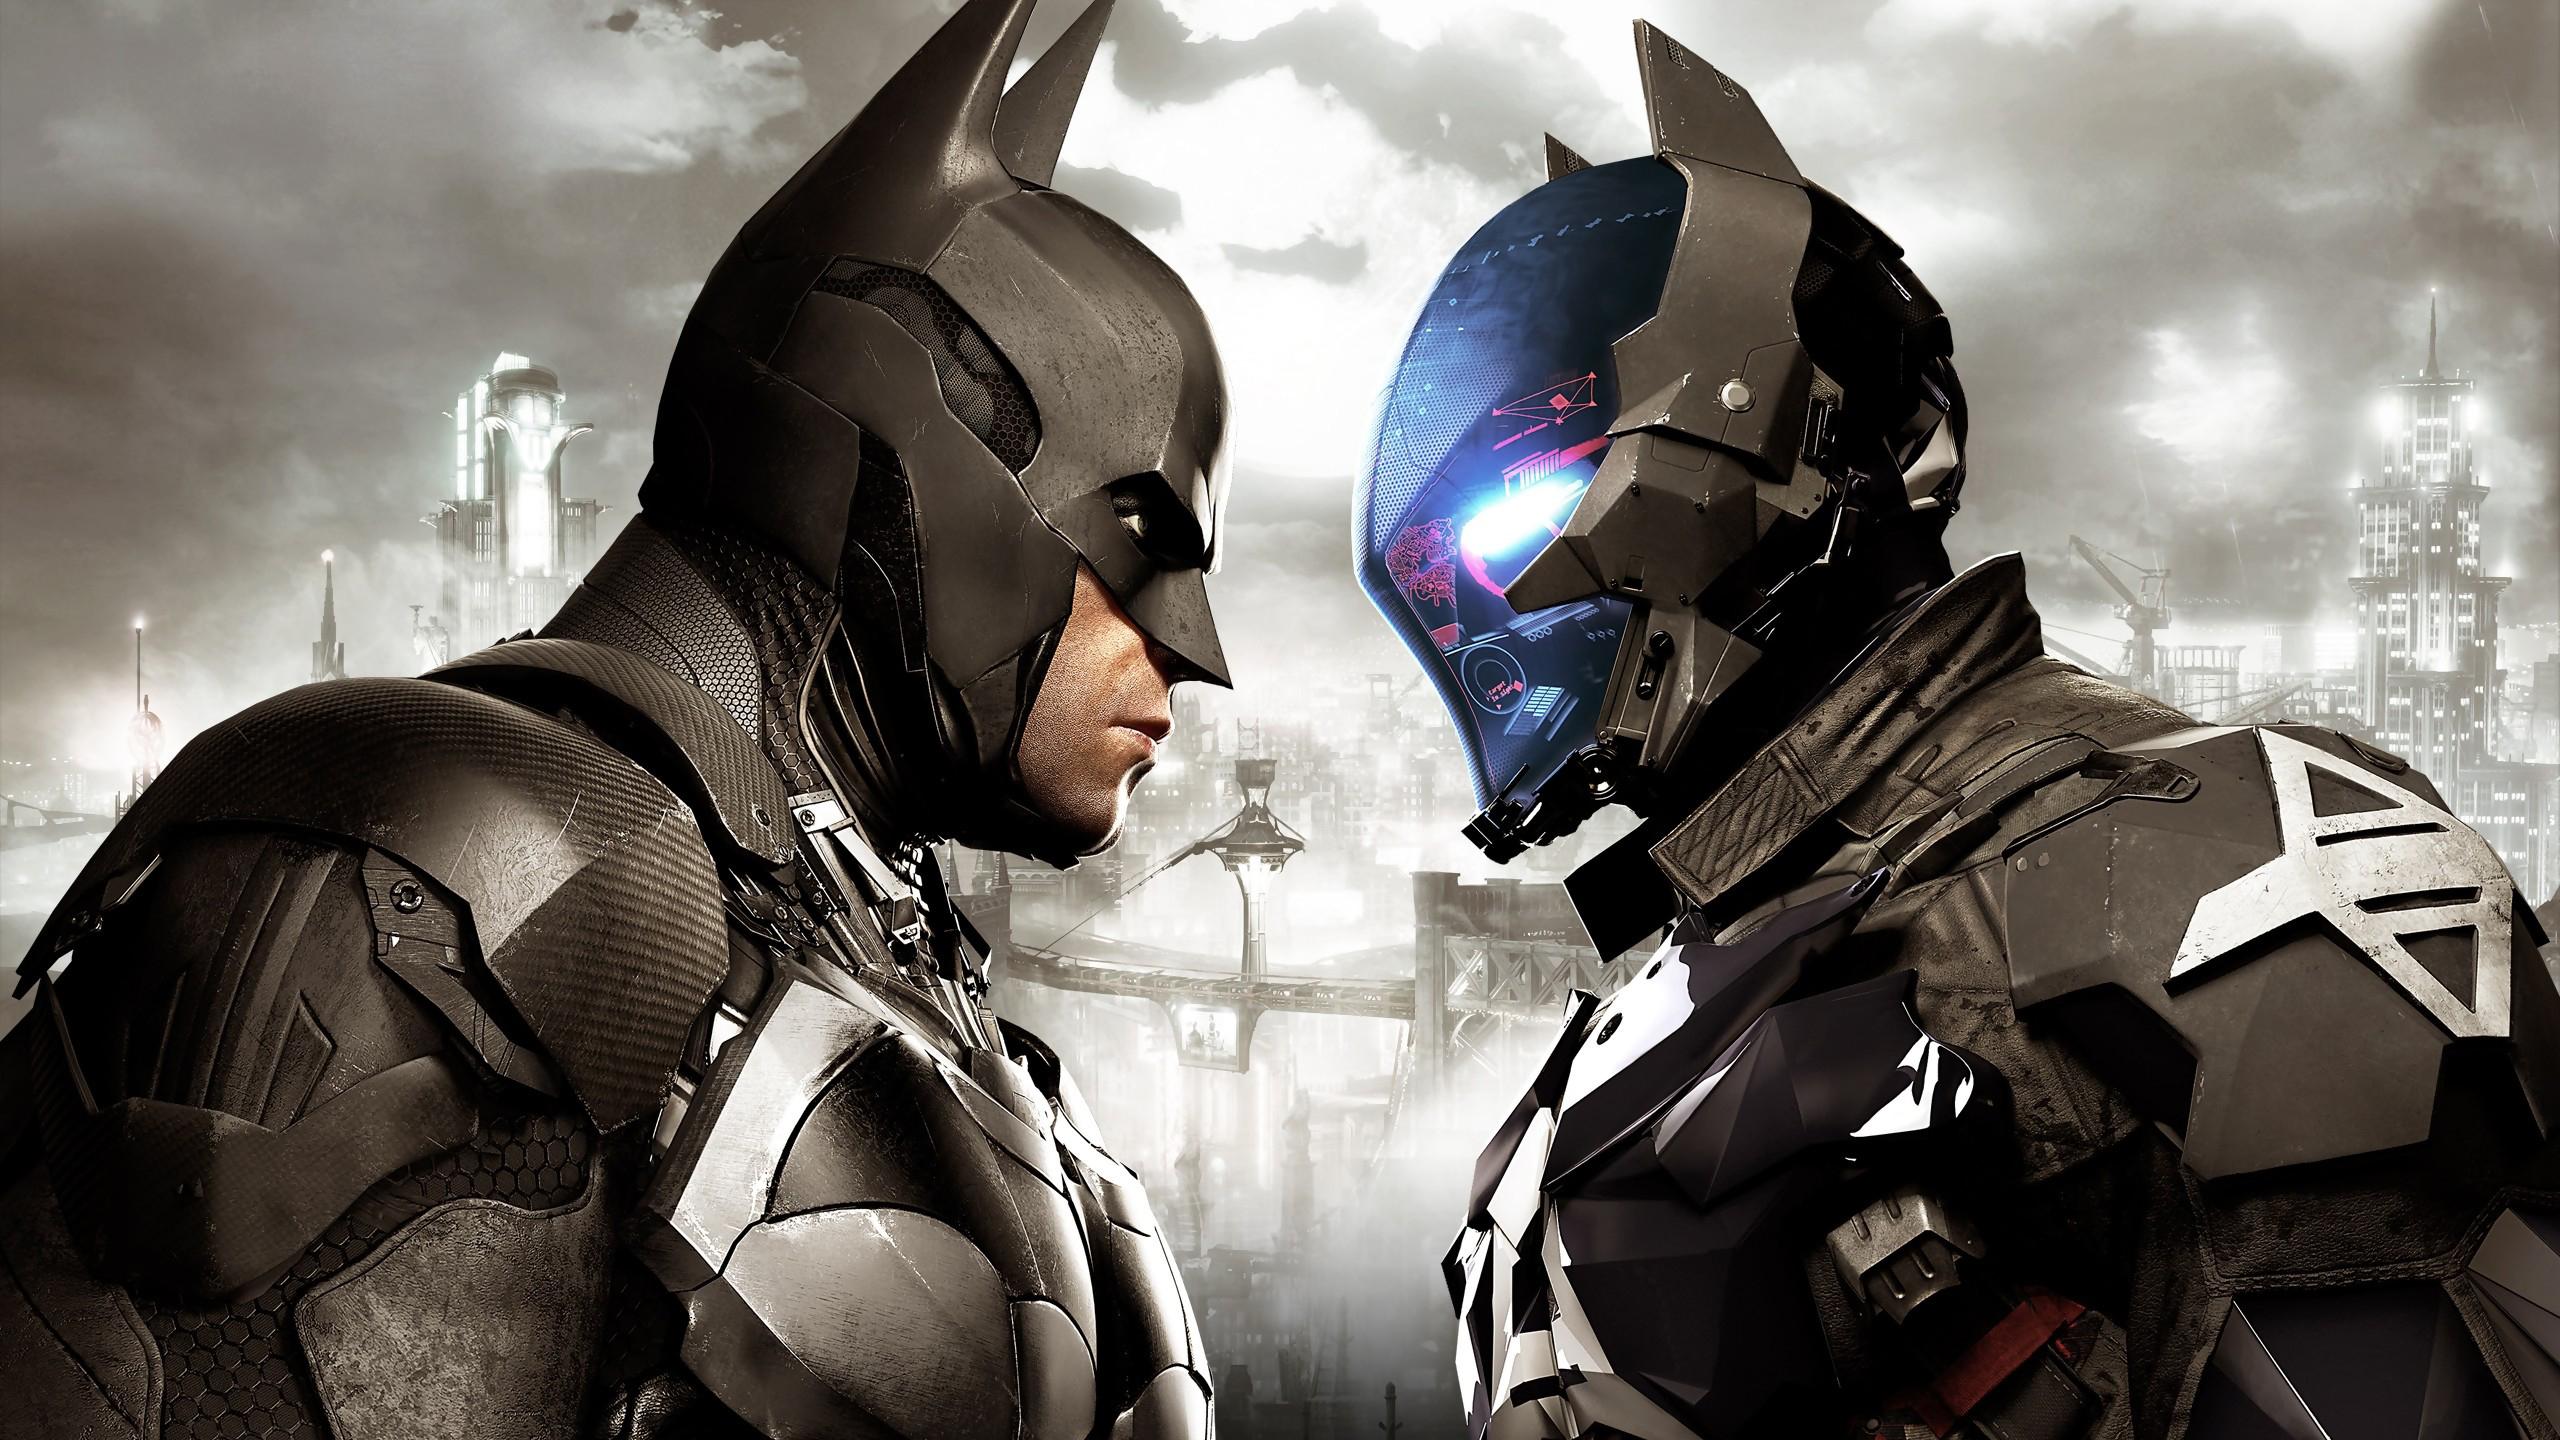 Batman Arkham Knight 1080p Wallpaper - WallpaperSafari